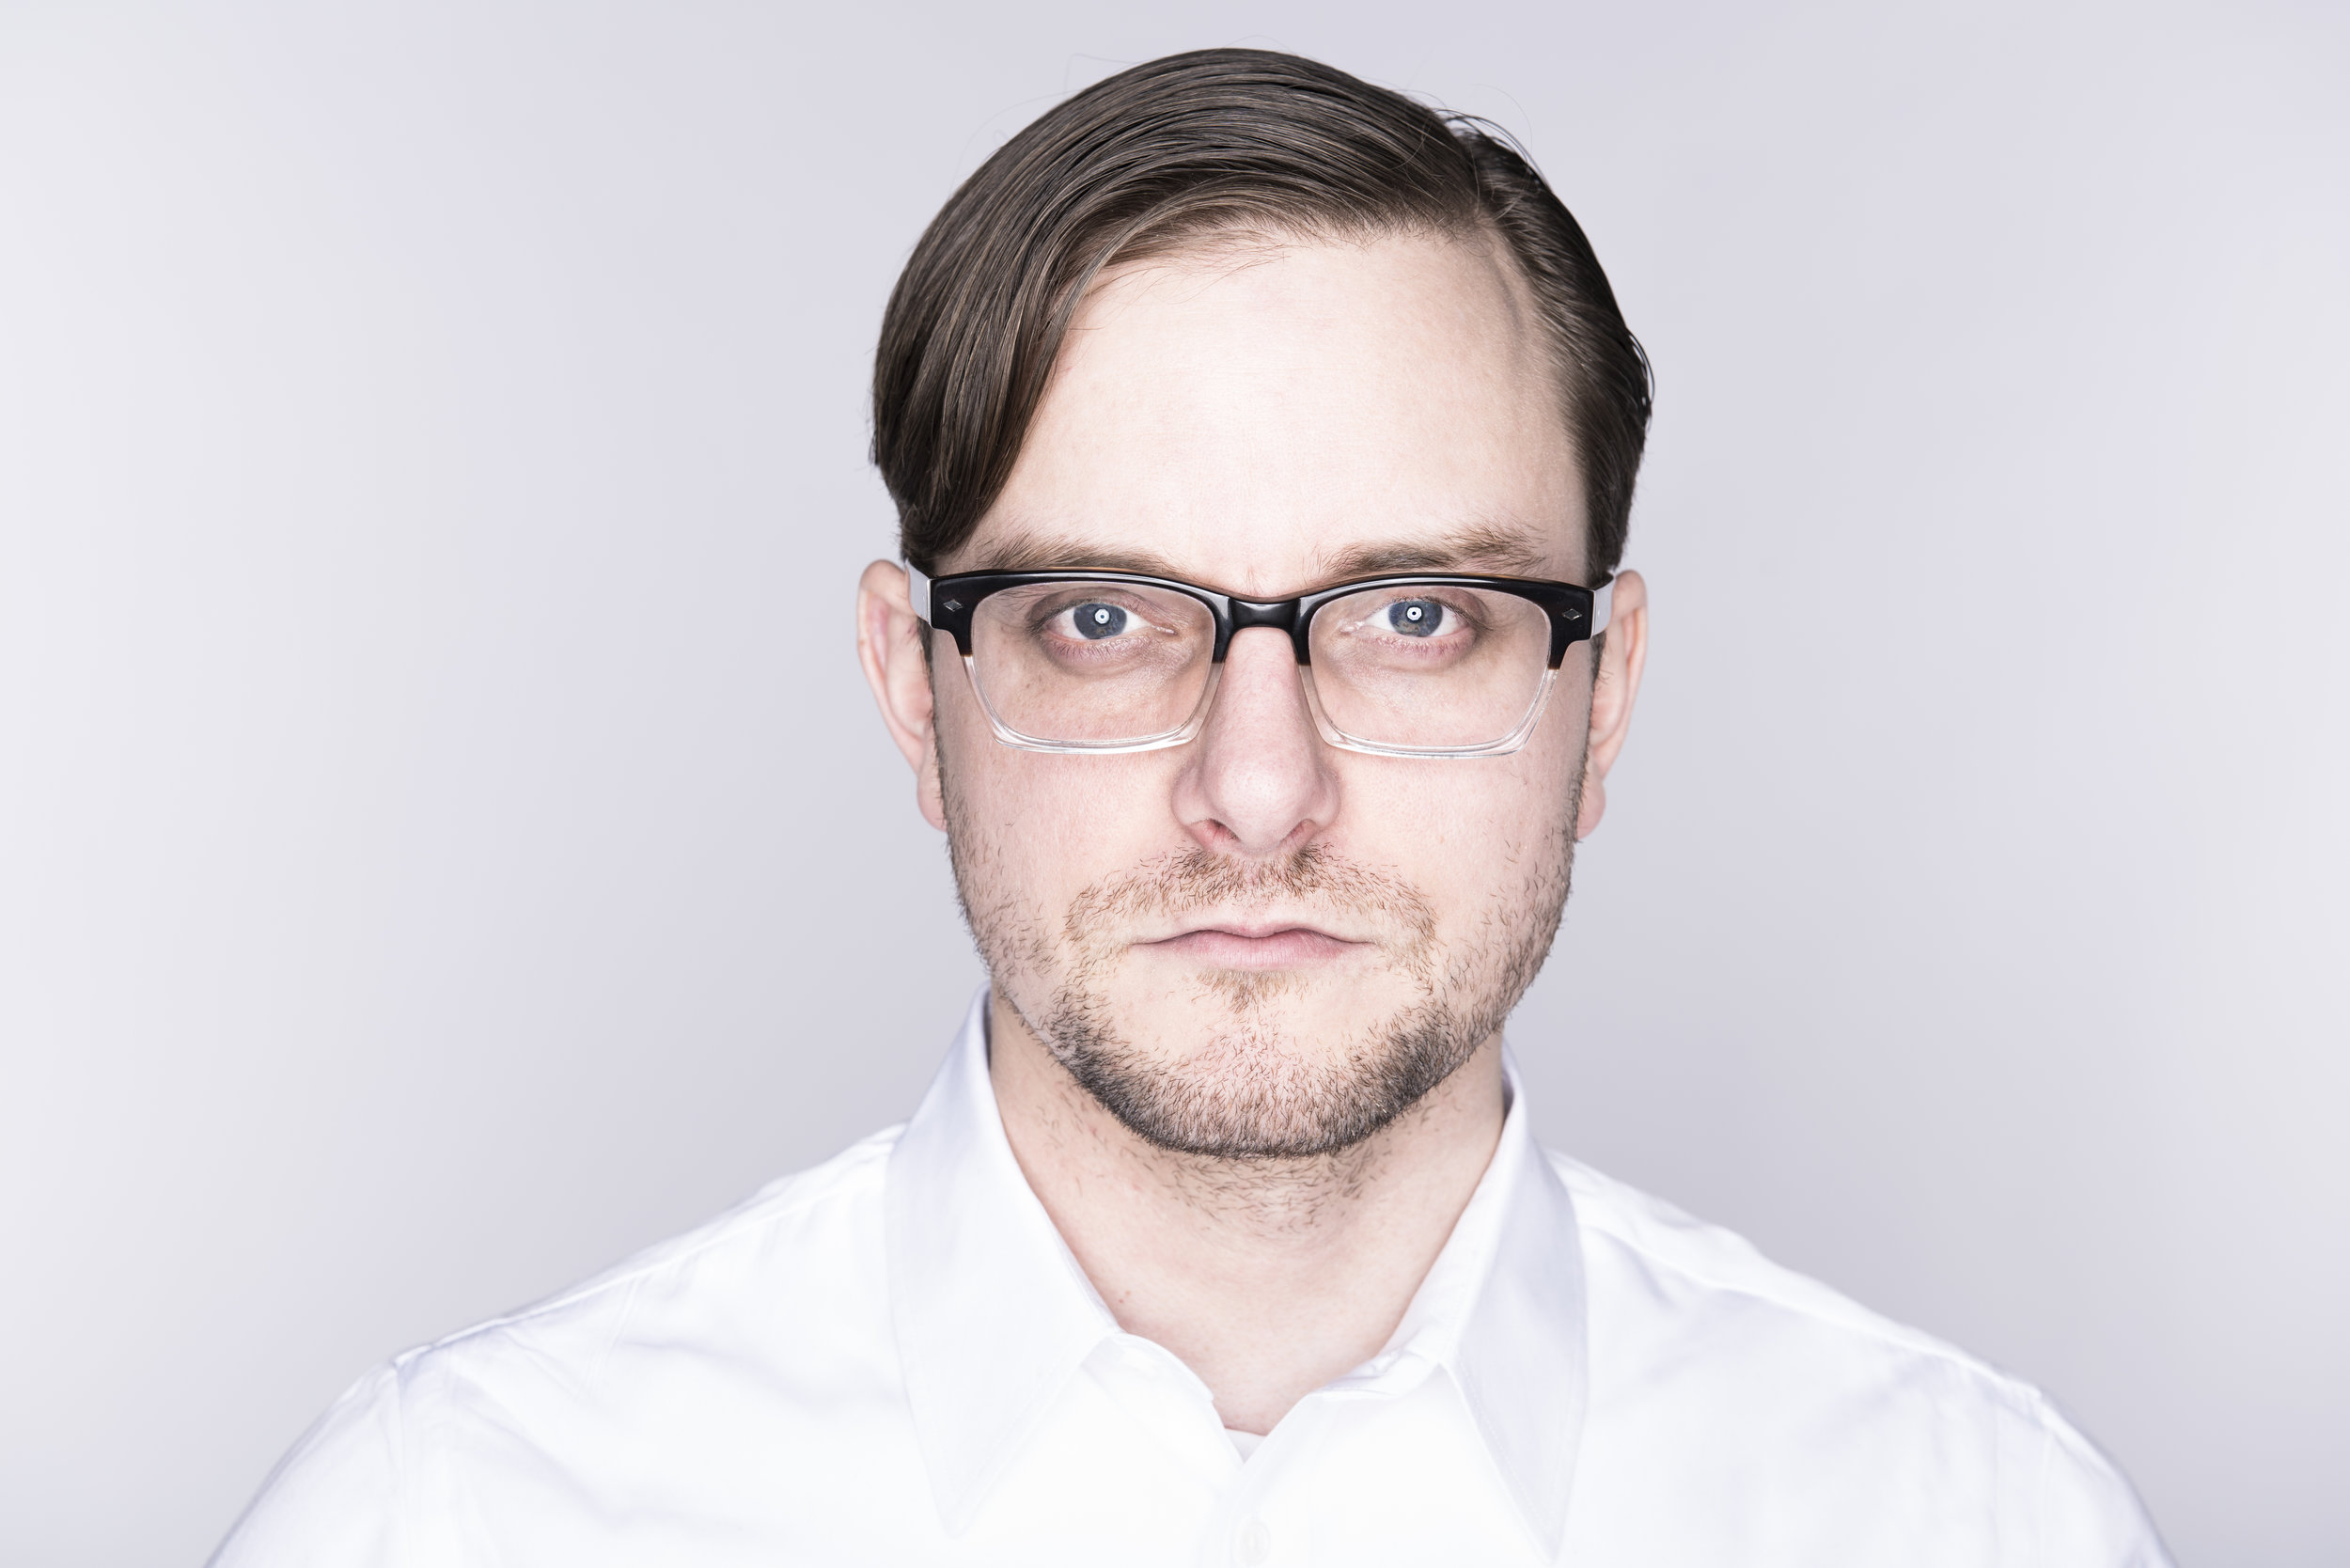 Sydney Skybetter/ Founding Producer